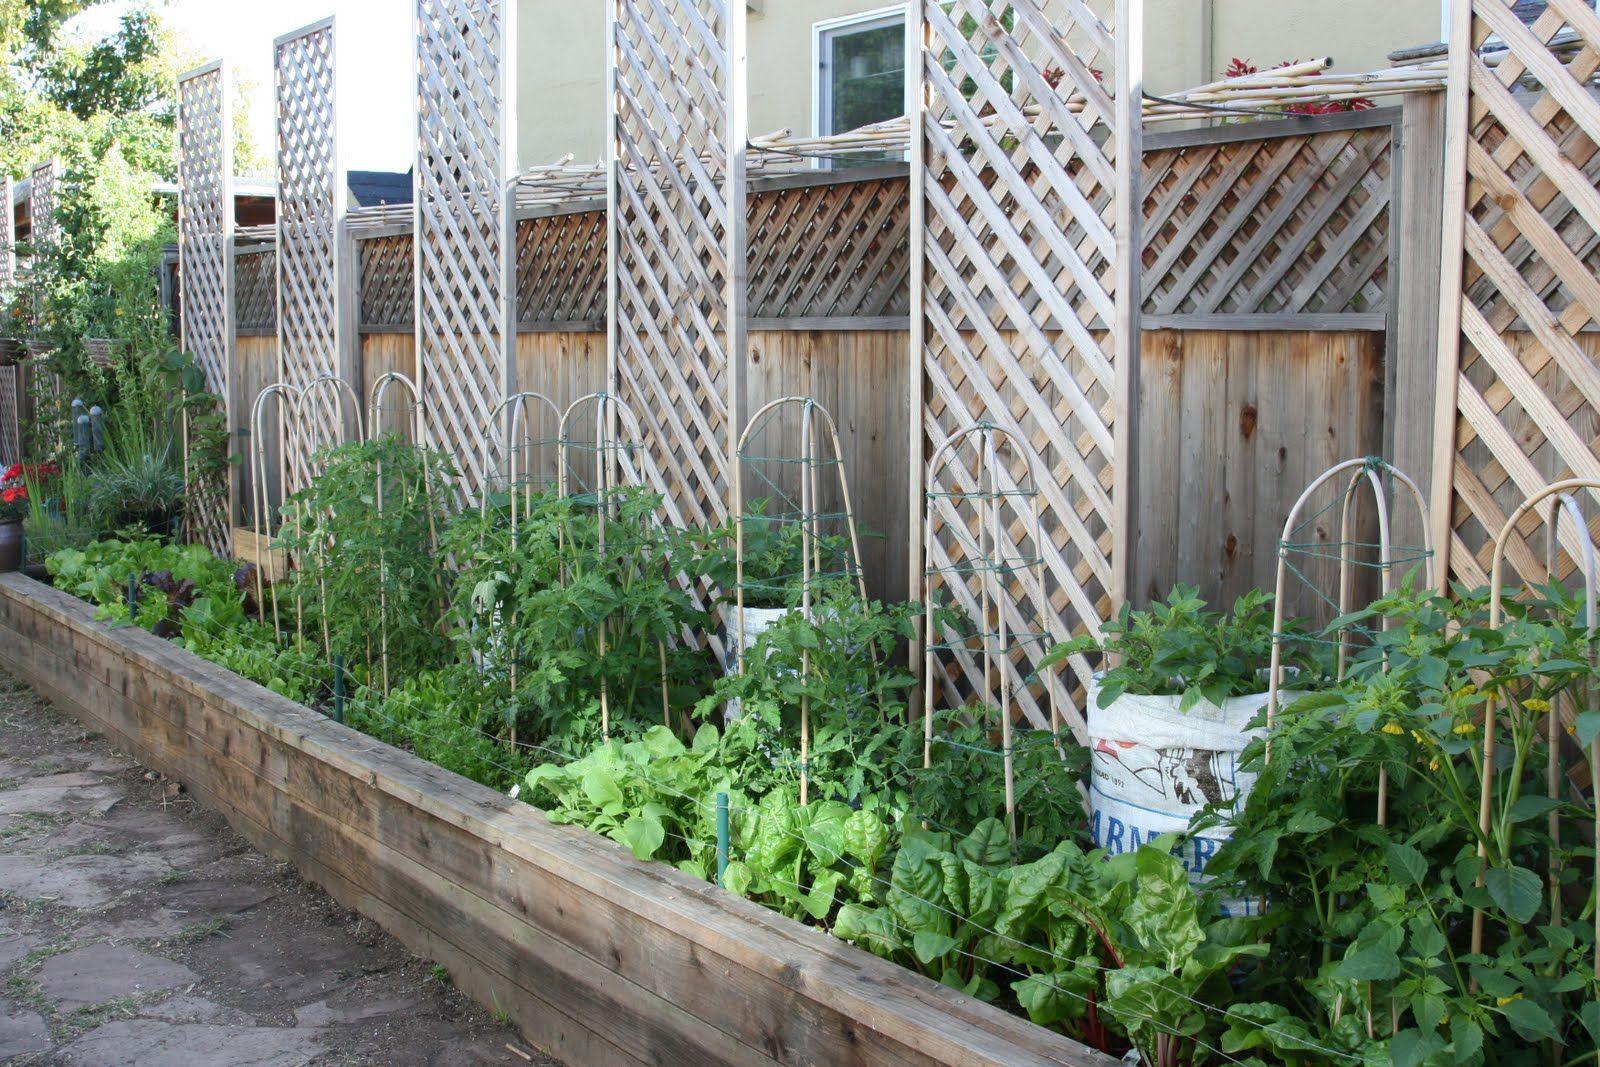 Raised beds along a fence Backyard